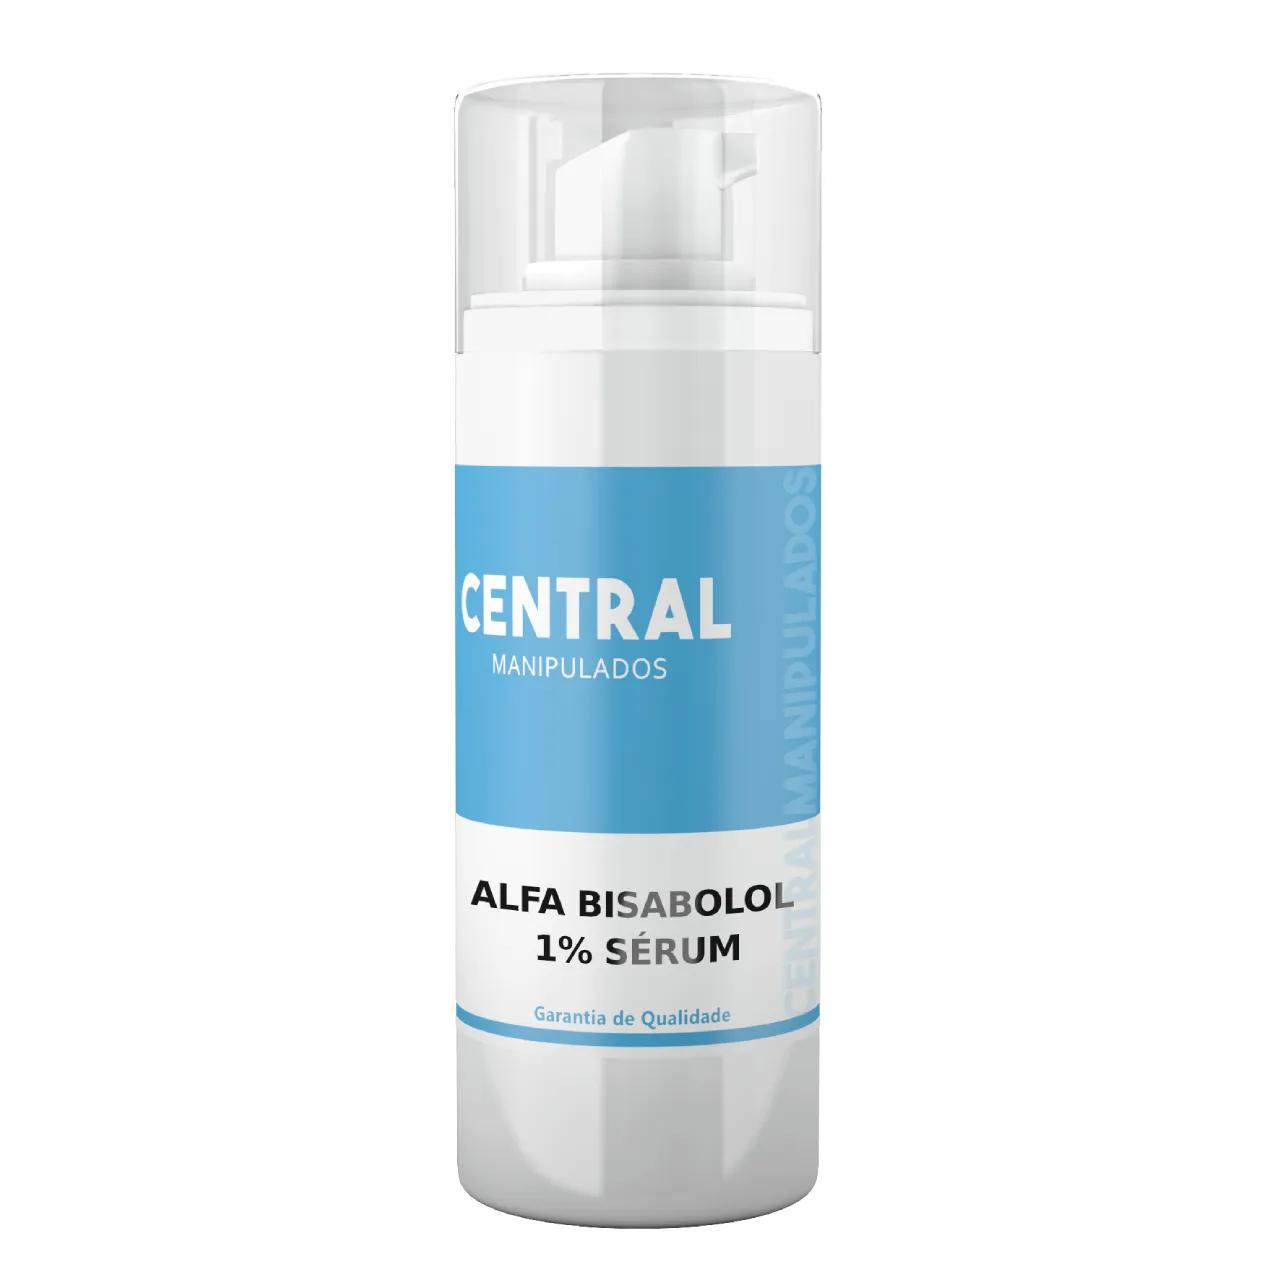 Alfa-Bisabolol 1% Sérum - Anti-inflamatorio para a Pele, Tira as Manchas, Anti-acne, Cicatrizante